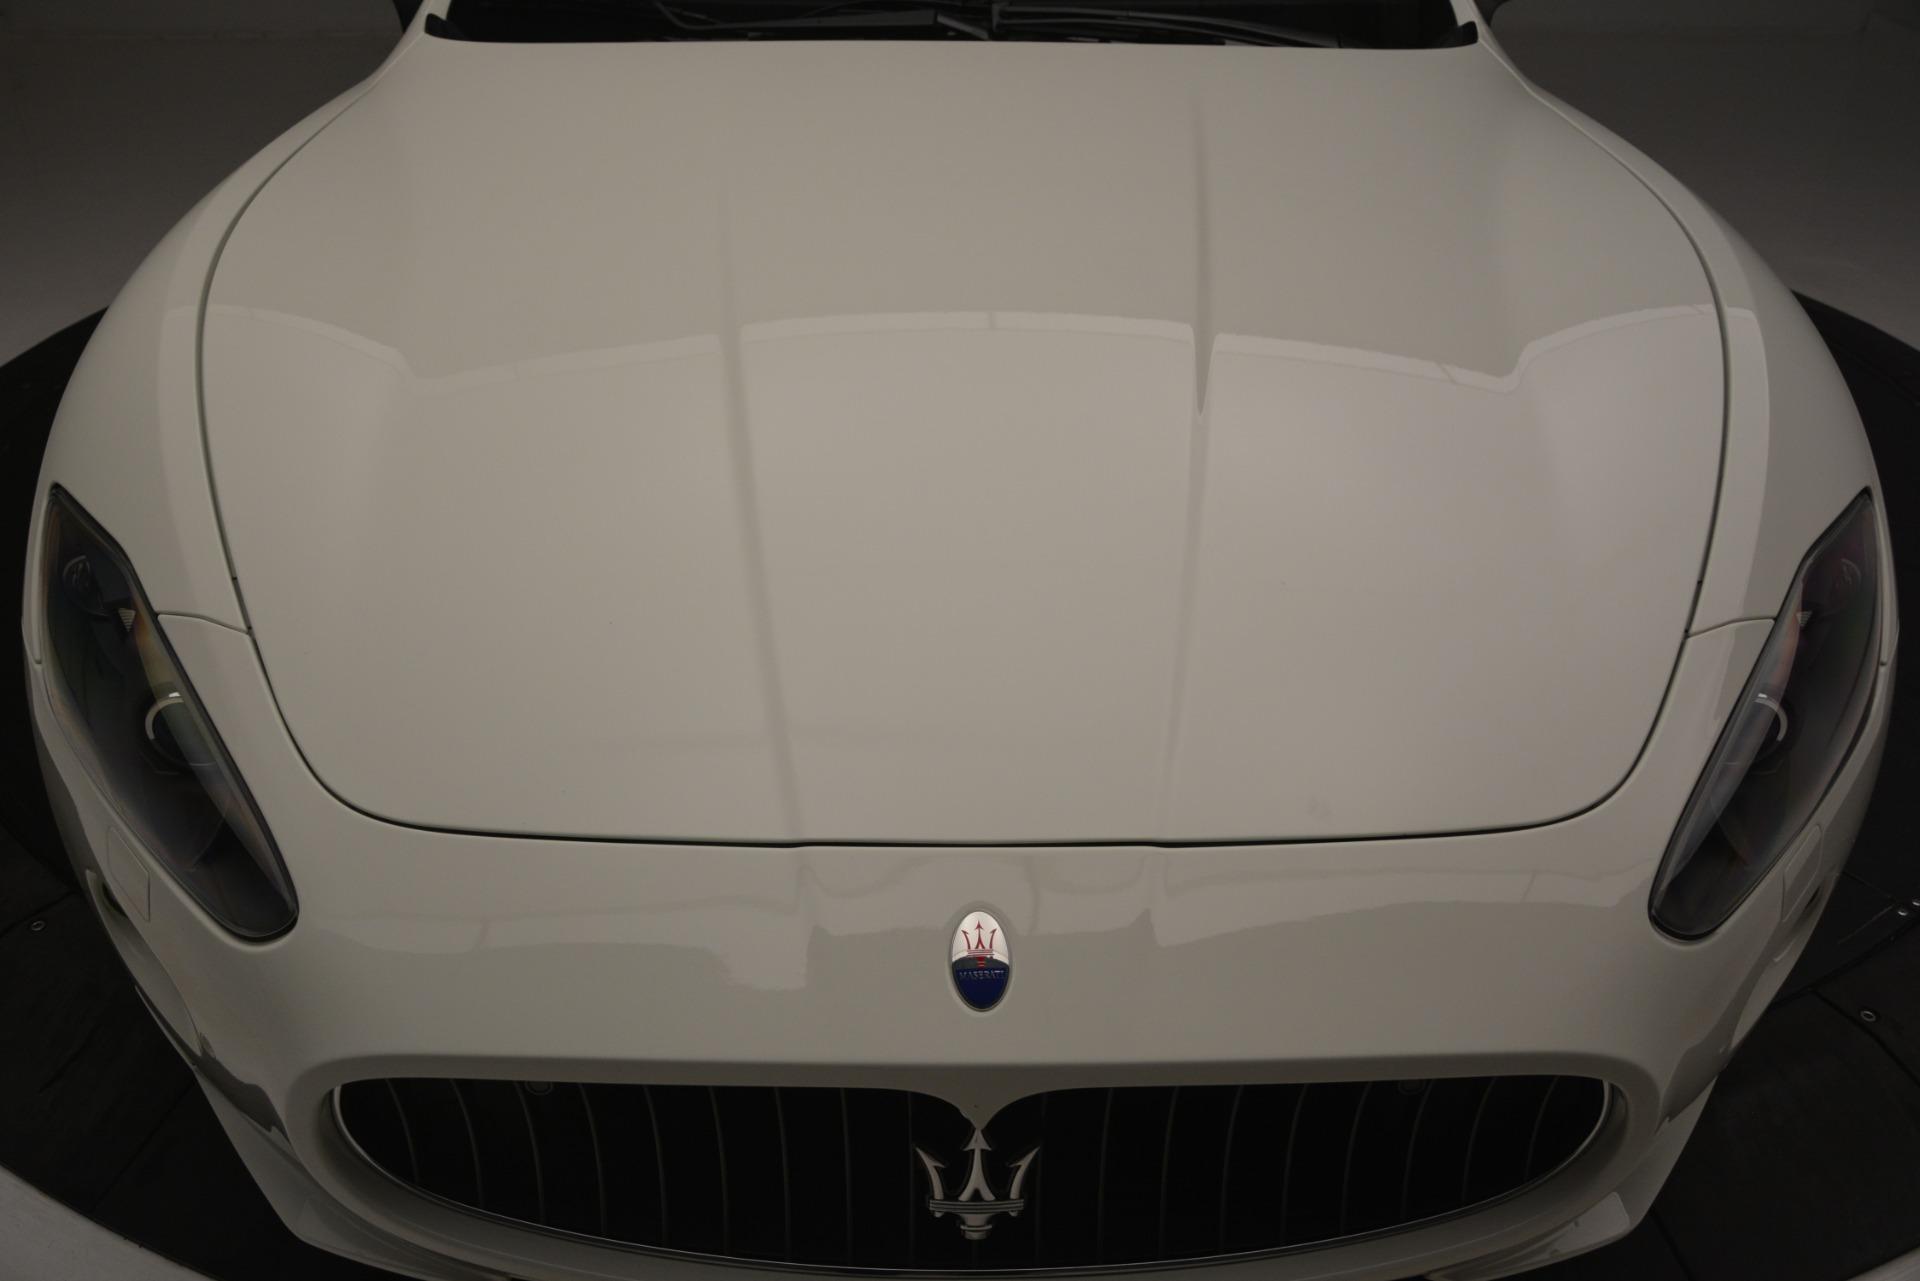 Used 2011 Maserati GranTurismo S Automatic For Sale In Westport, CT 3061_p24